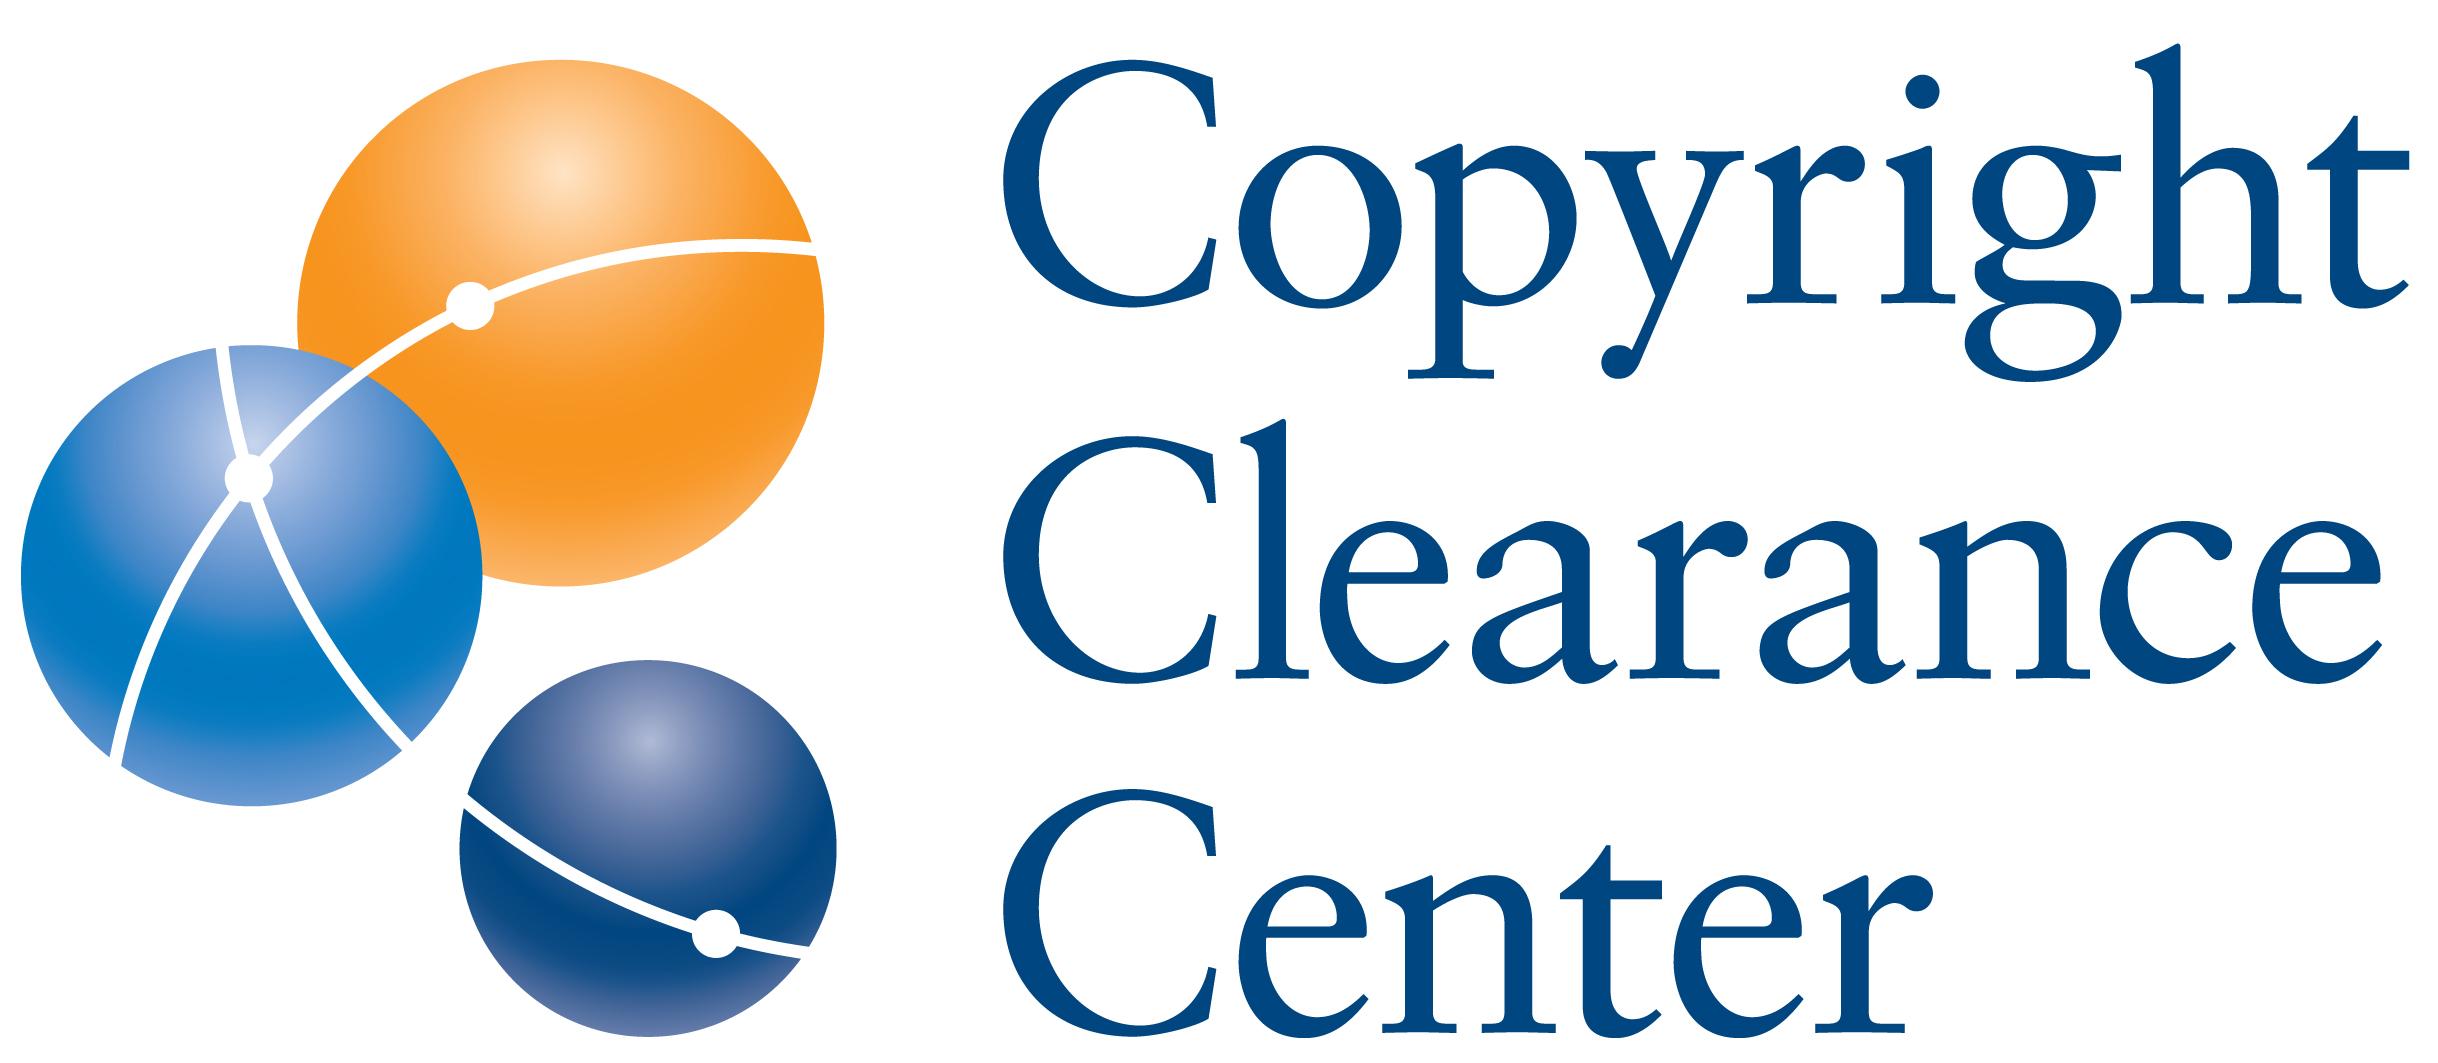 CCC_RGB.jpg